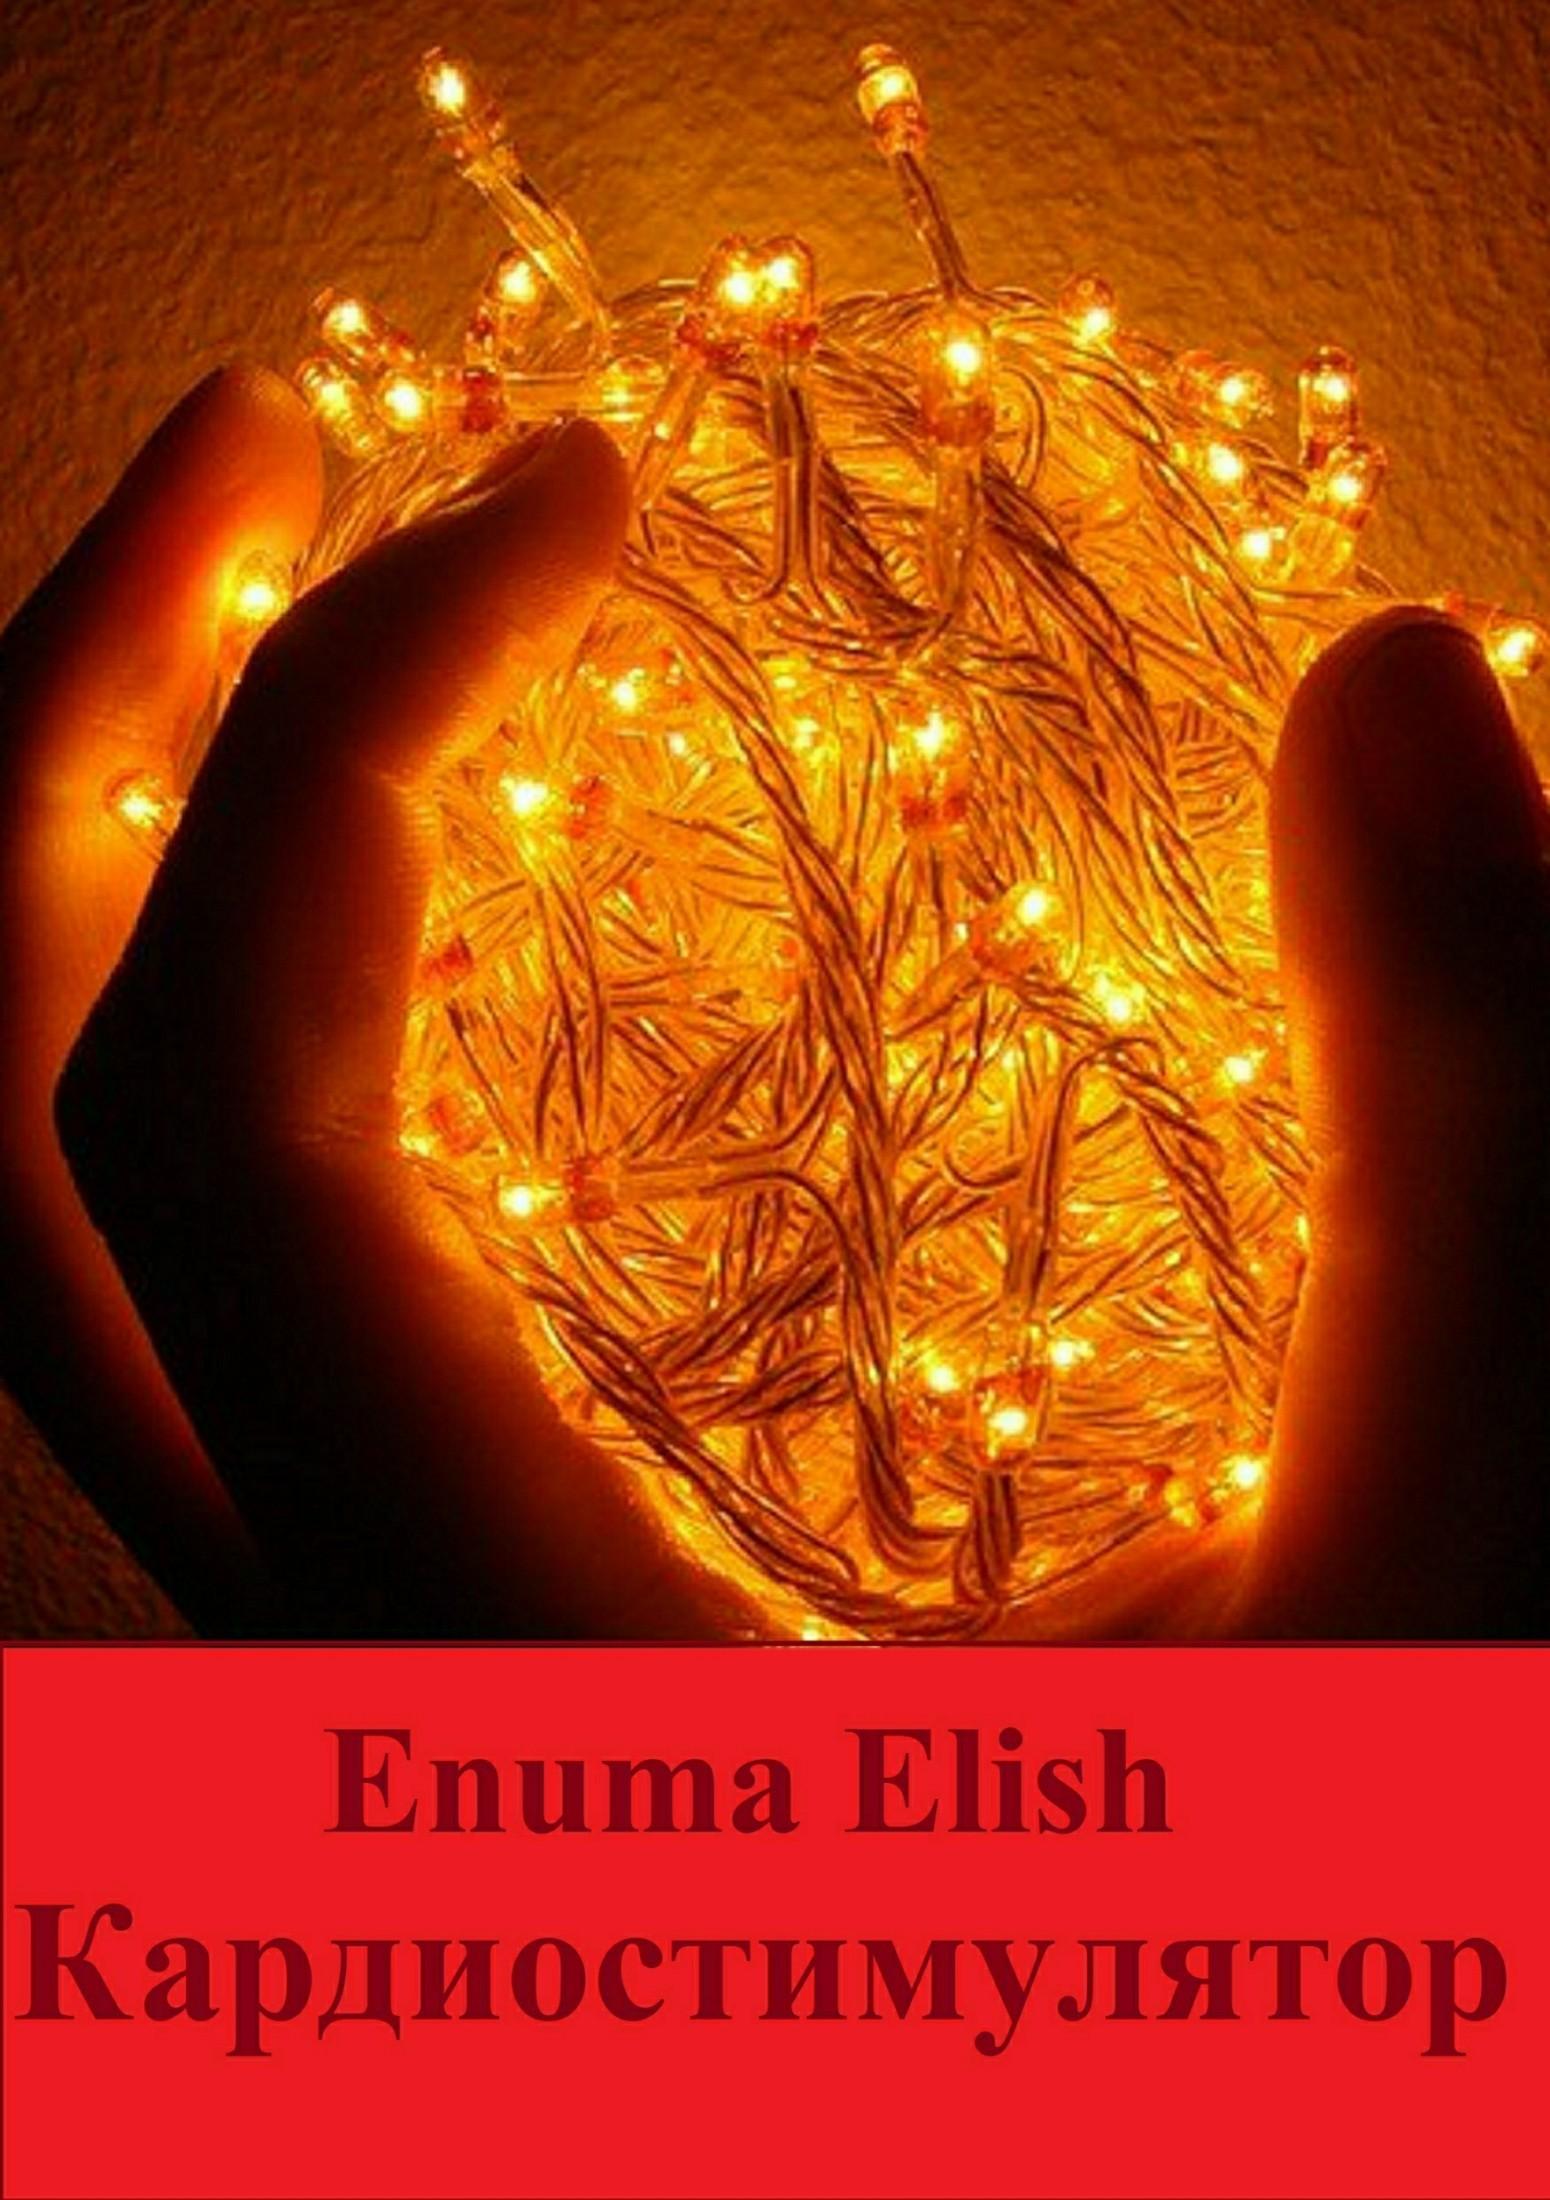 Enuma Elish «Кардиостимулятор»